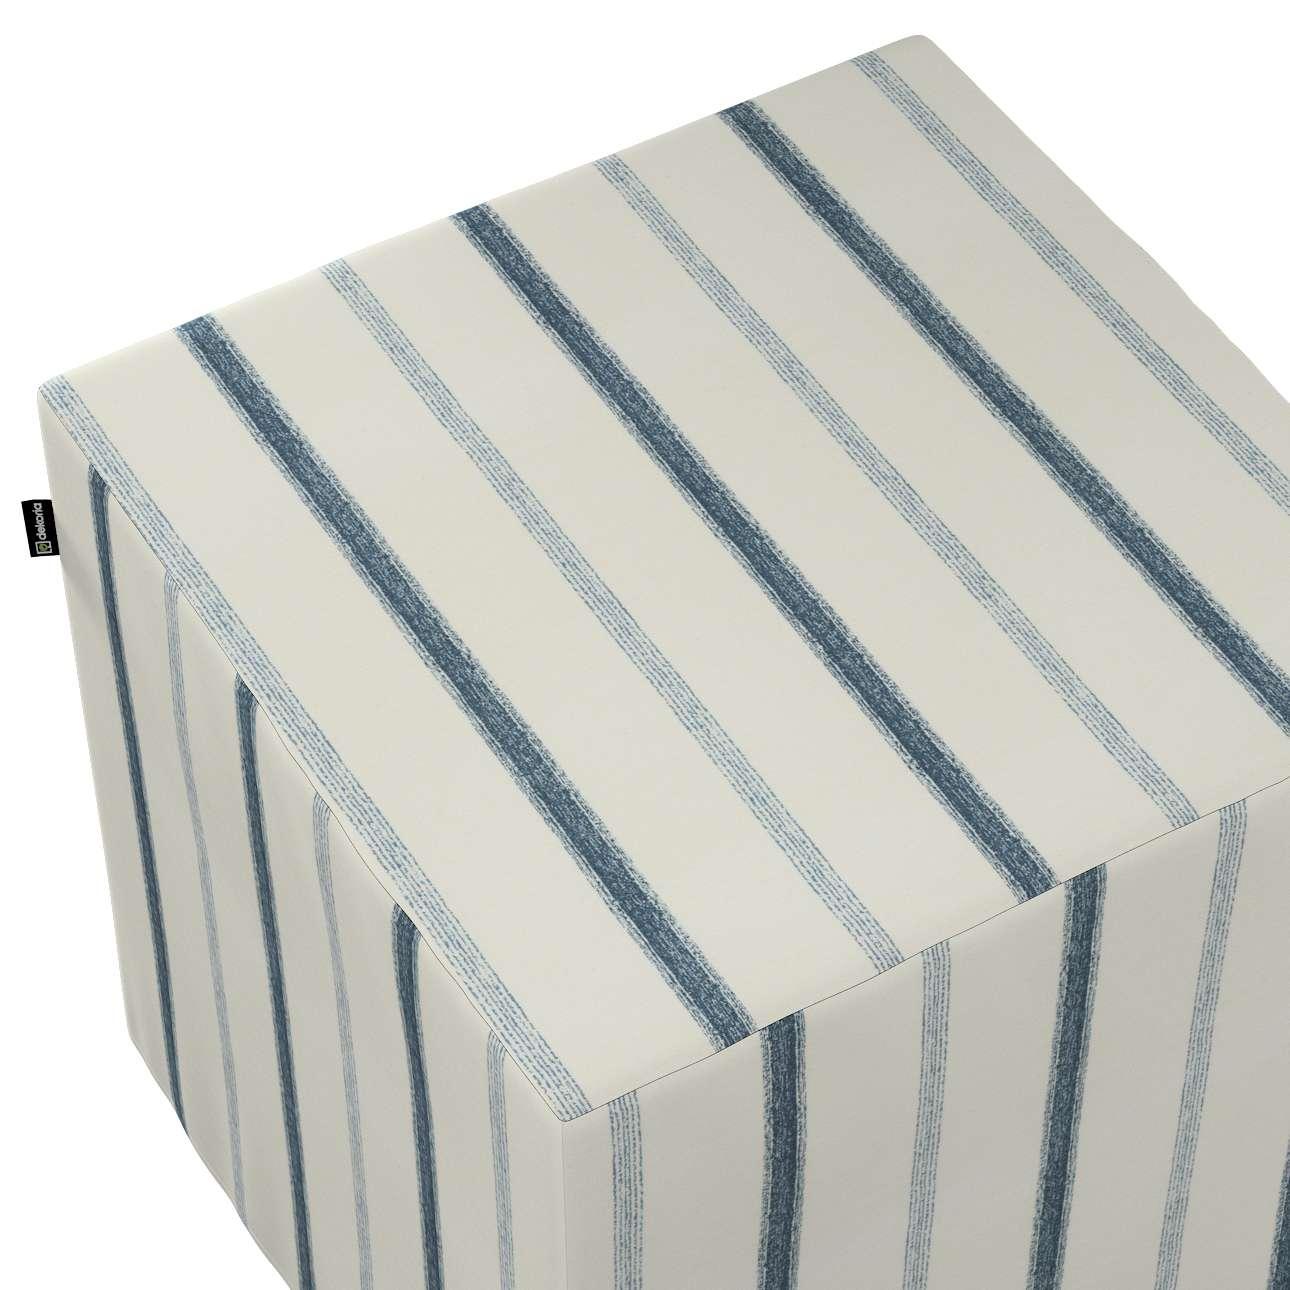 Pufa kostka twarda w kolekcji Avinon, tkanina: 129-66